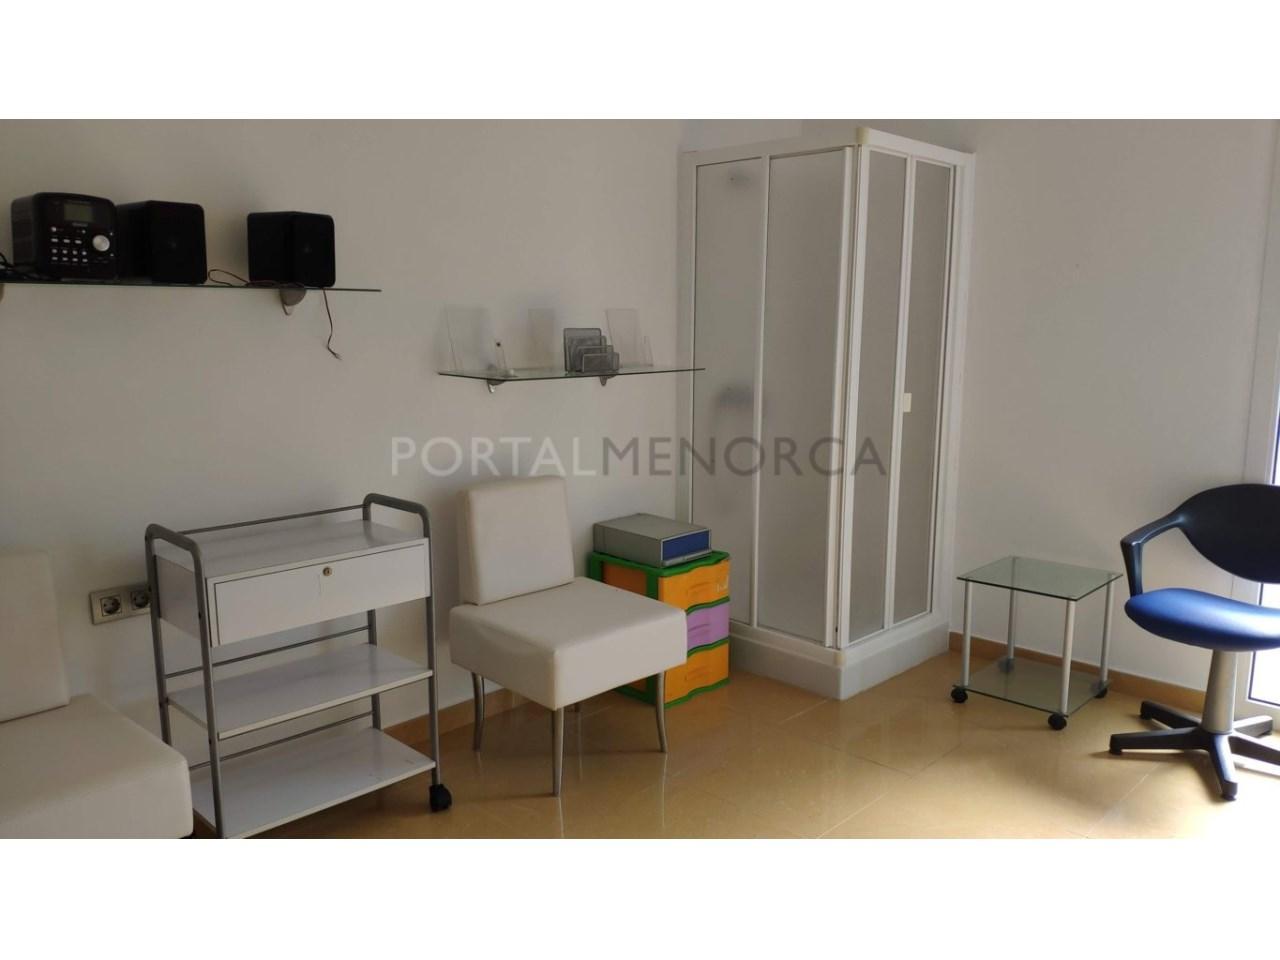 Local for sale in Ciutadella Menorca-Room with shower